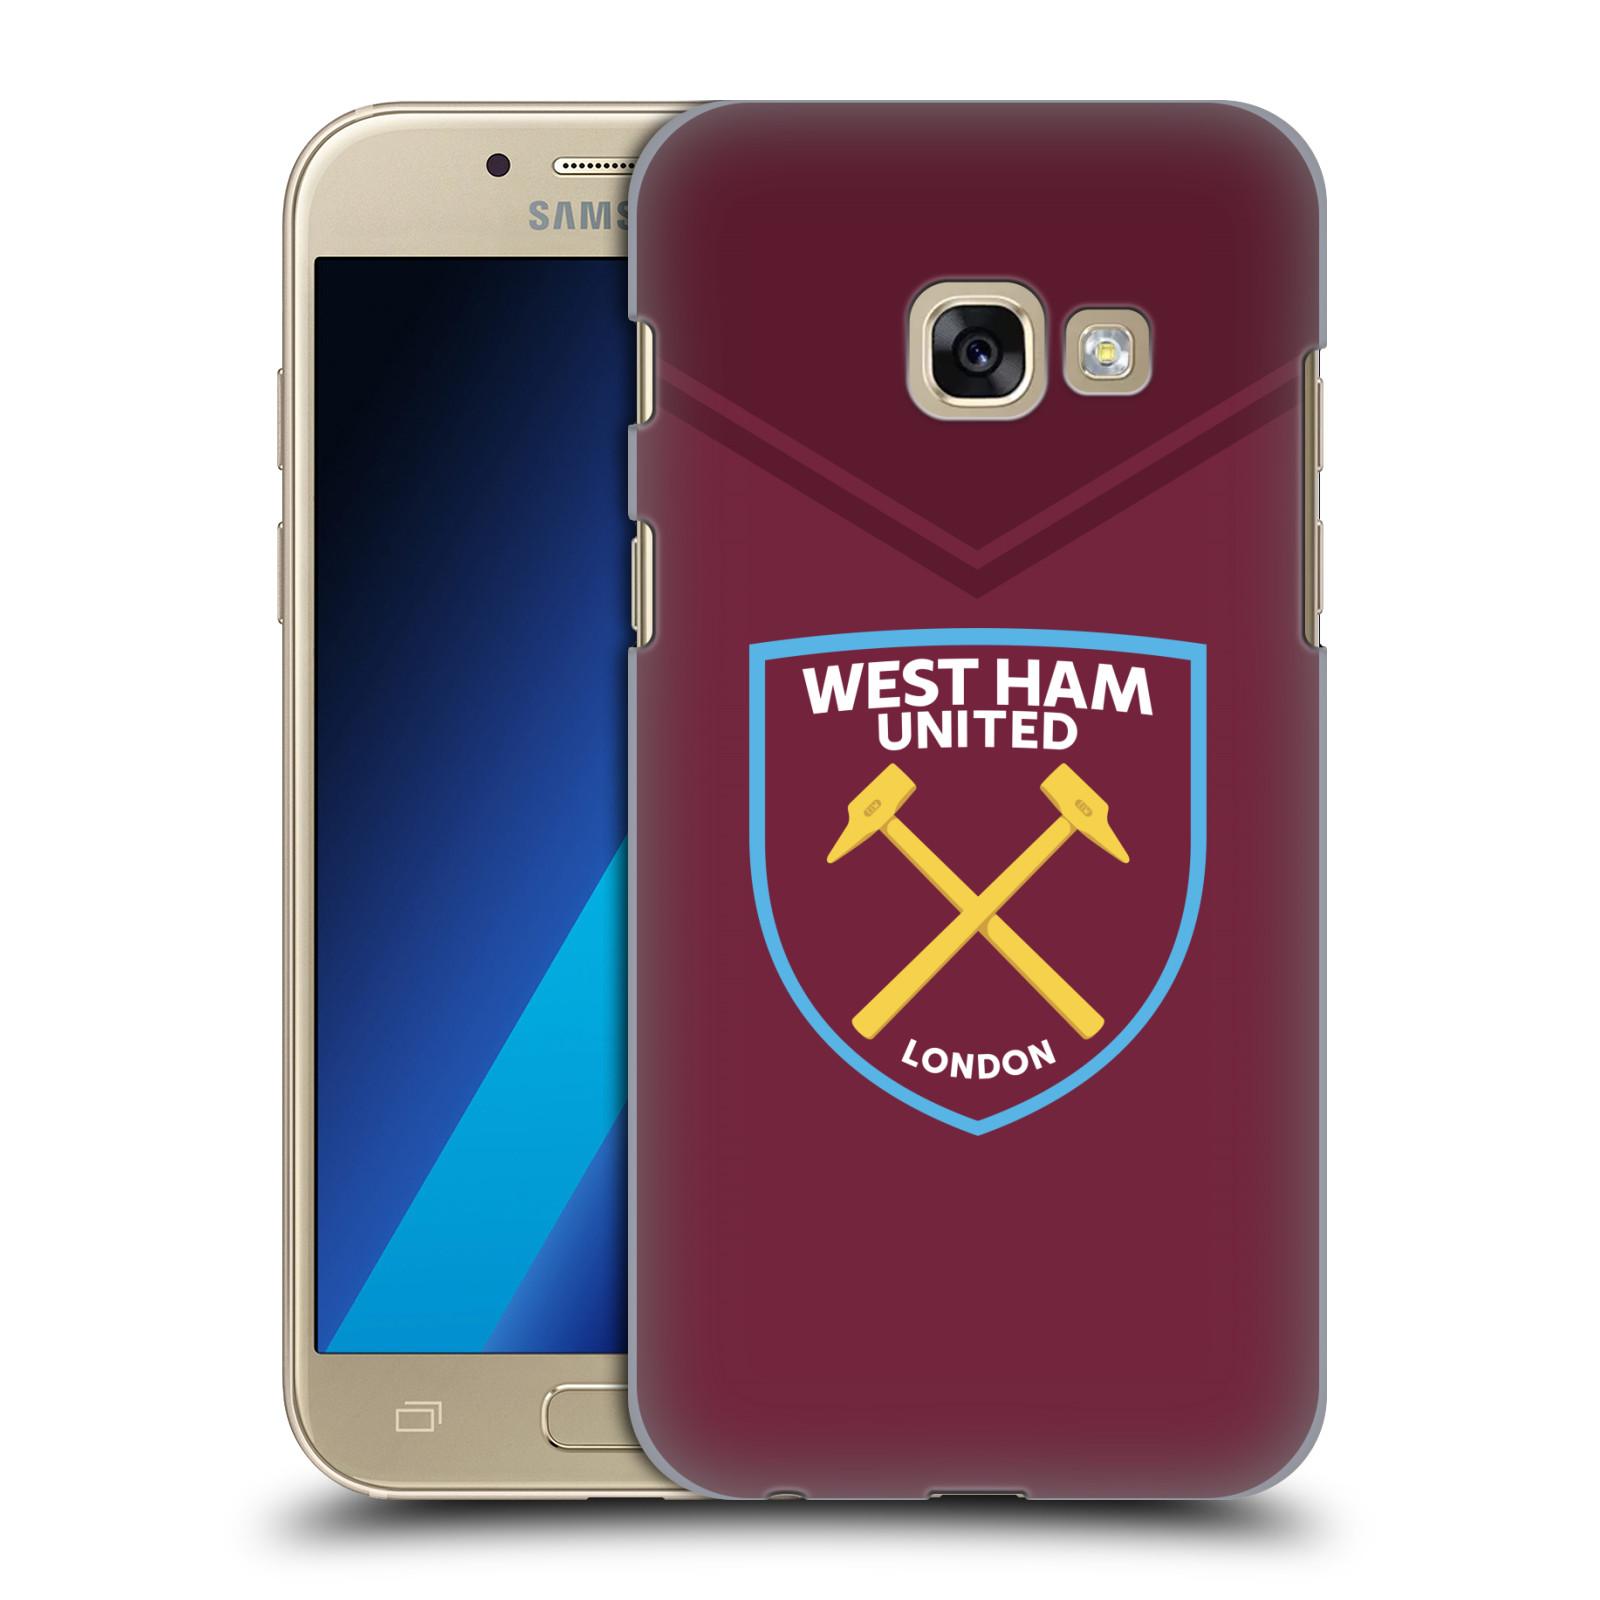 Plastové pouzdro na mobil Samsung Galaxy A3 (2017) - Head Case - West Ham United - Logo